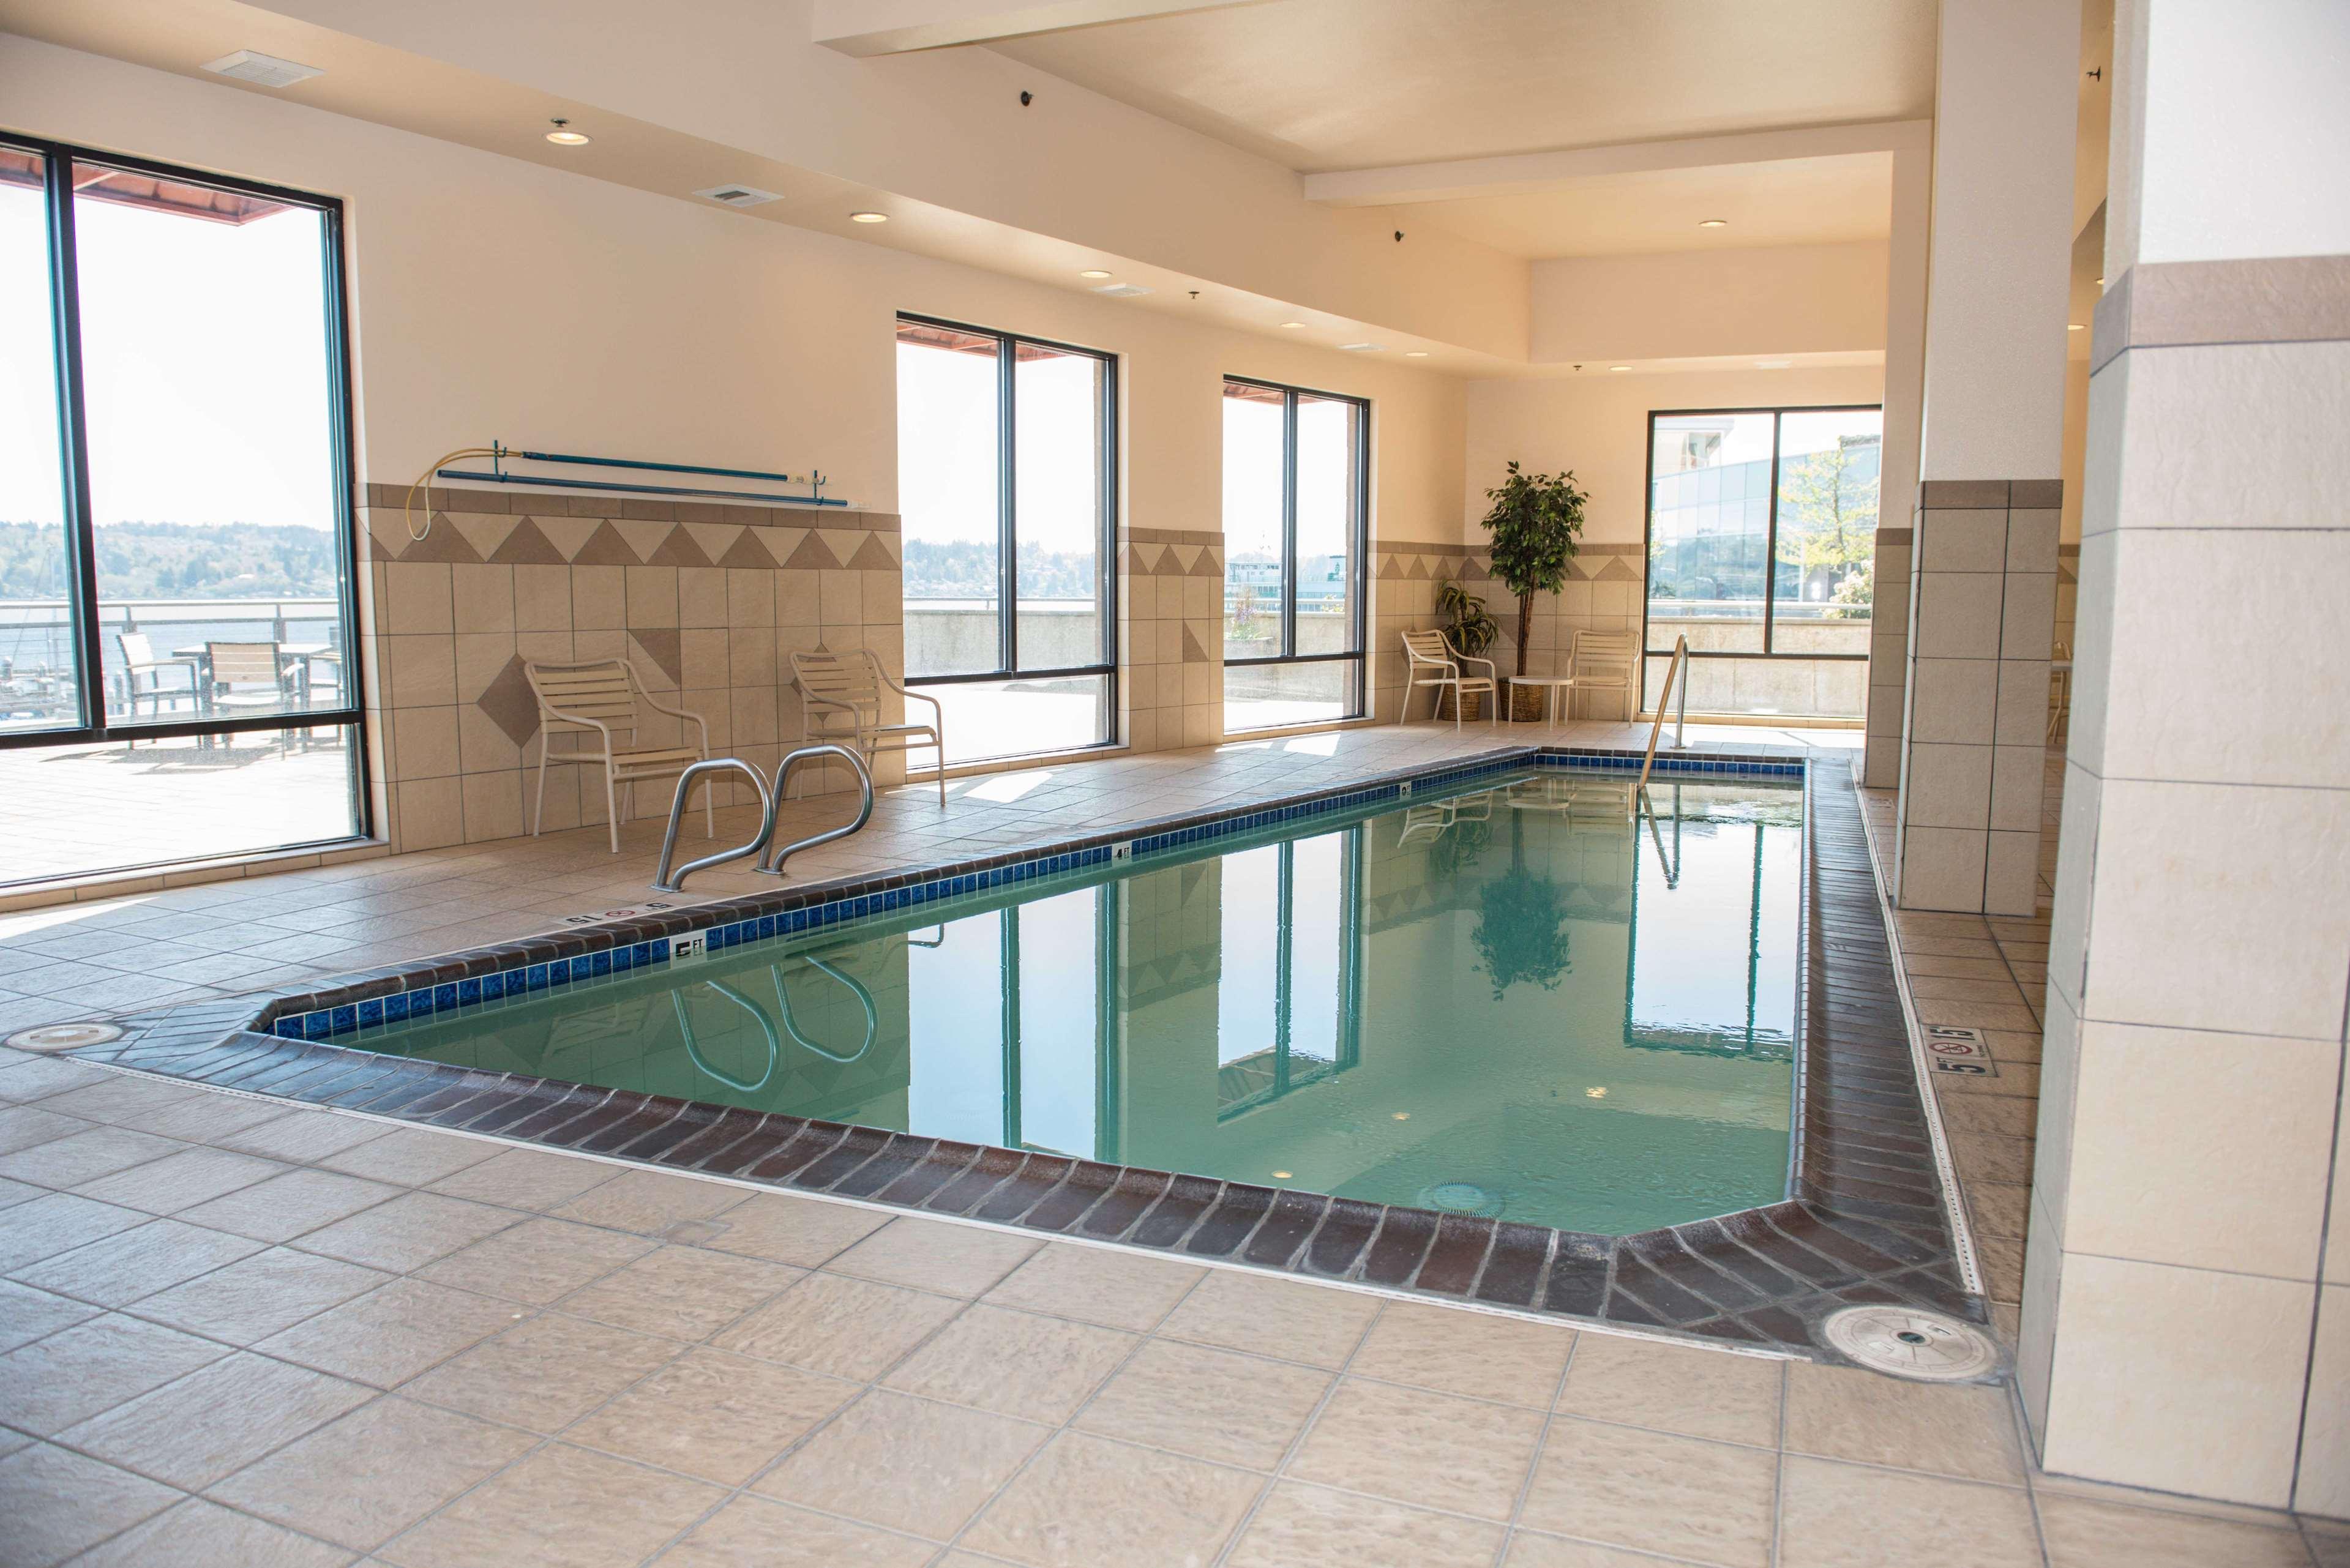 Hampton Inn & Suites Bremerton image 11